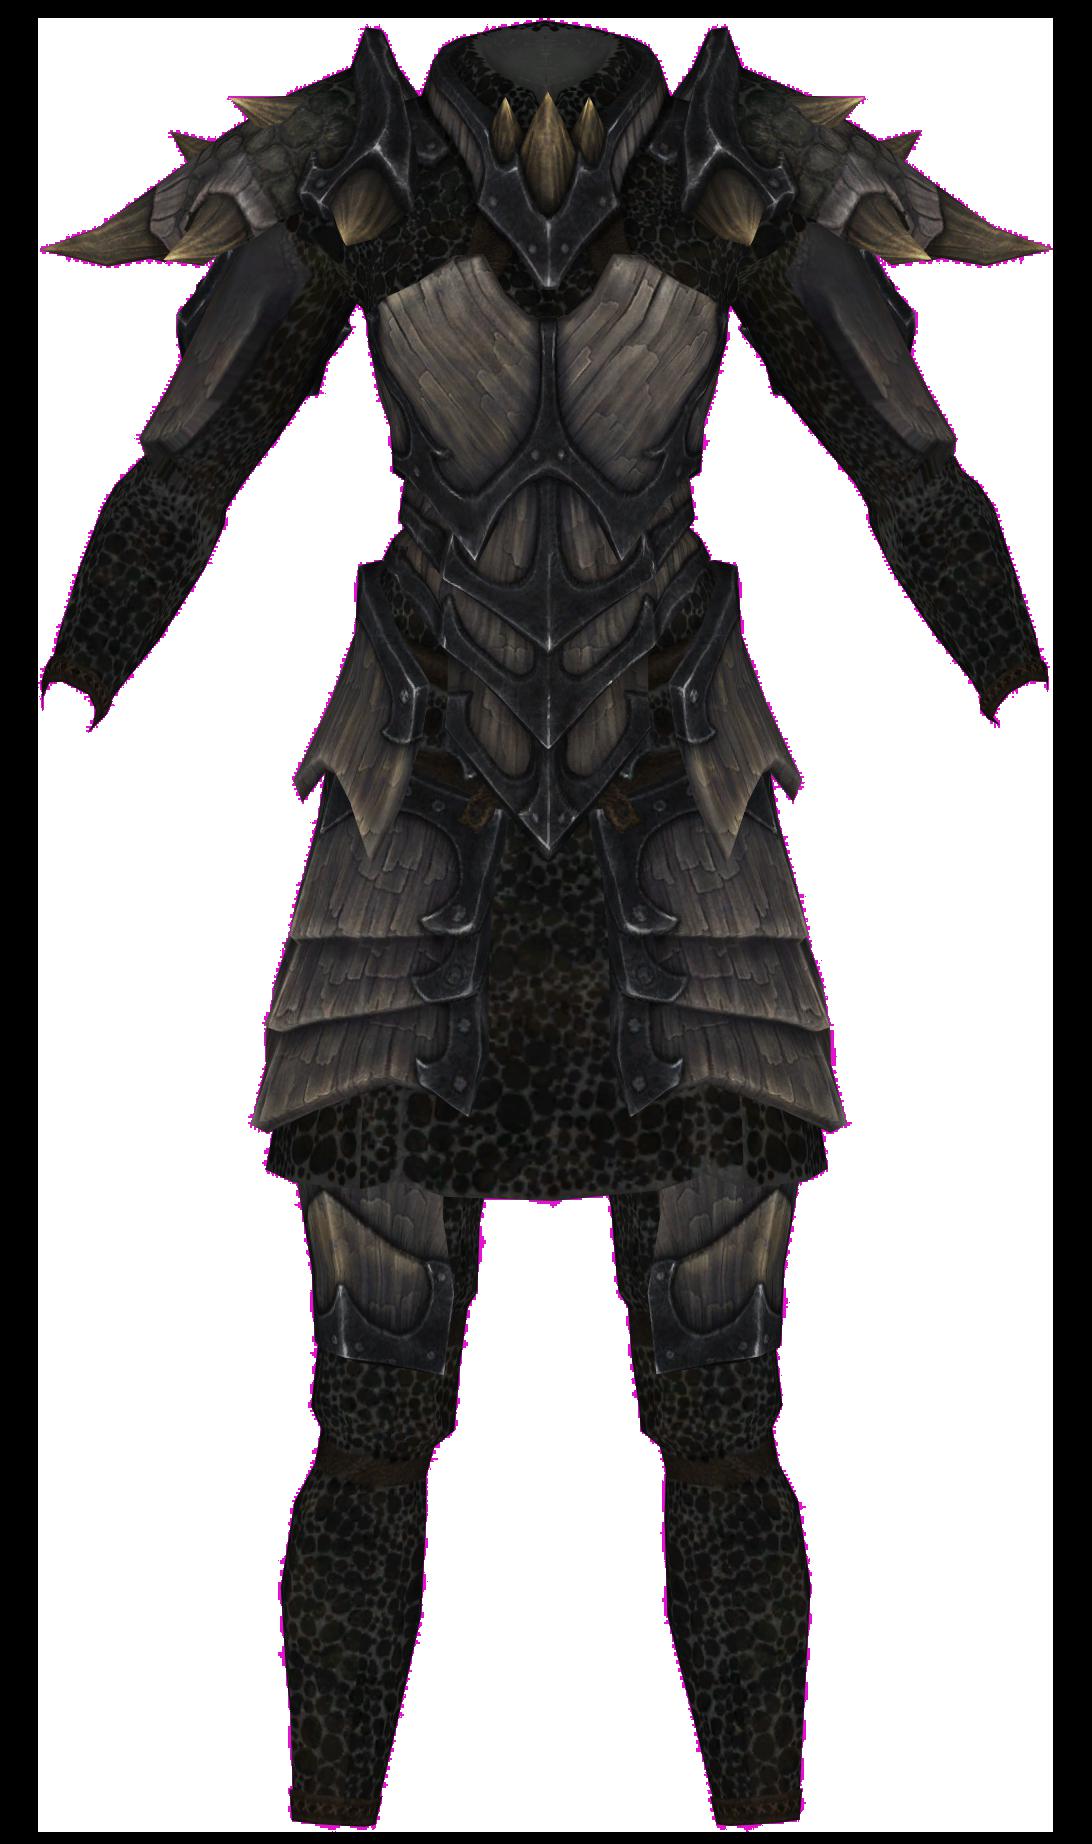 Dragonscale Armor Armor Piece Elder Scrolls Fandom Zerofrost mythical armors and dragon. dragonscale armor armor piece elder